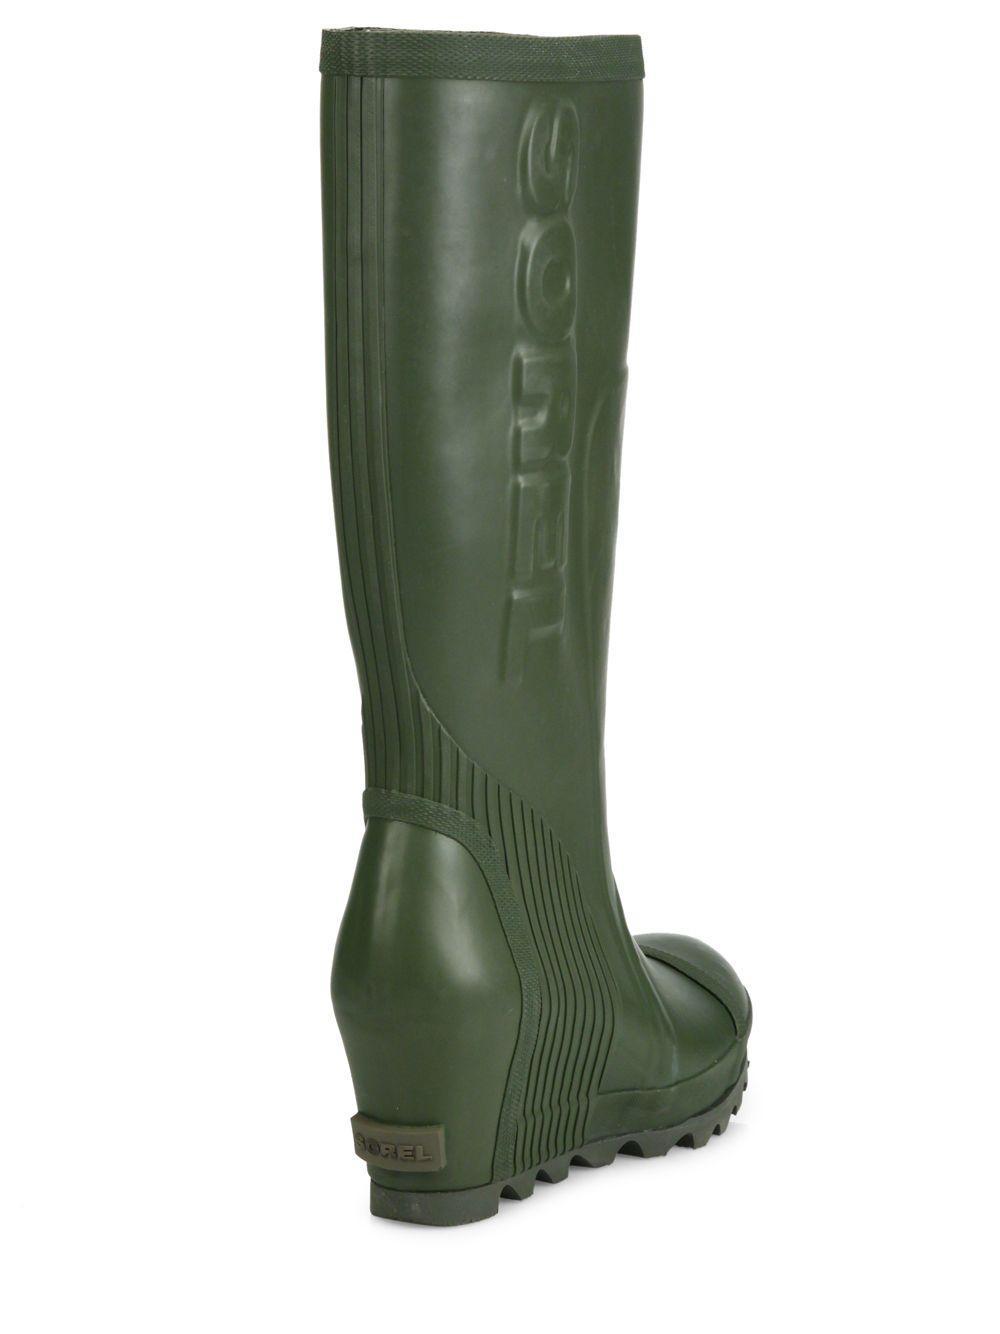 3eb9352e731 Sorel Wedge Rain Boots - Image Collections Boot